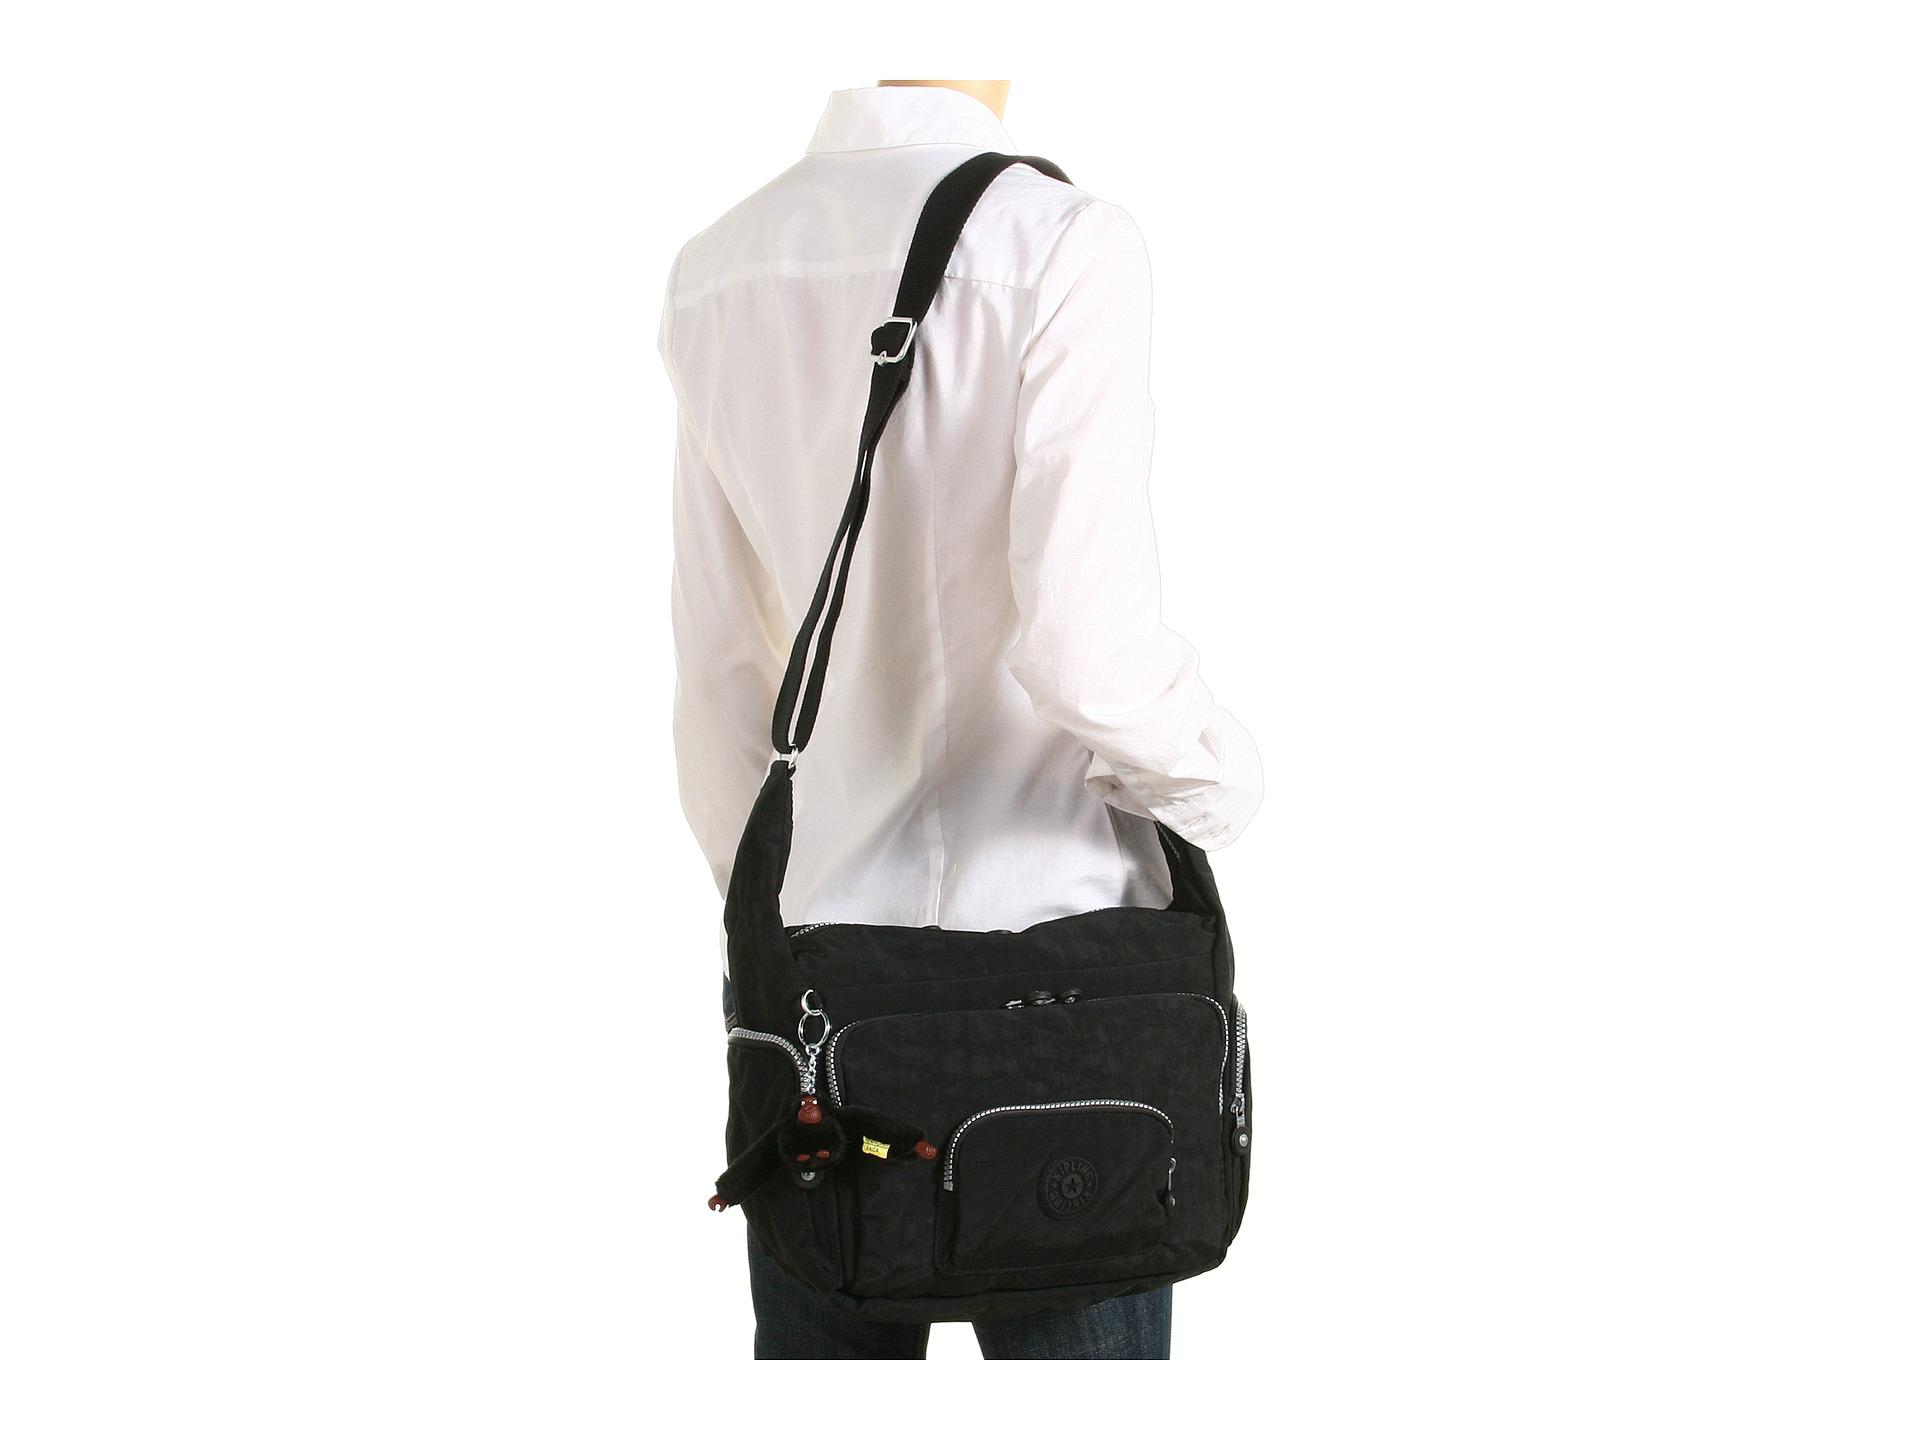 Kipling Europa Large Crossover Bag Bags Shipped Free At Zappos